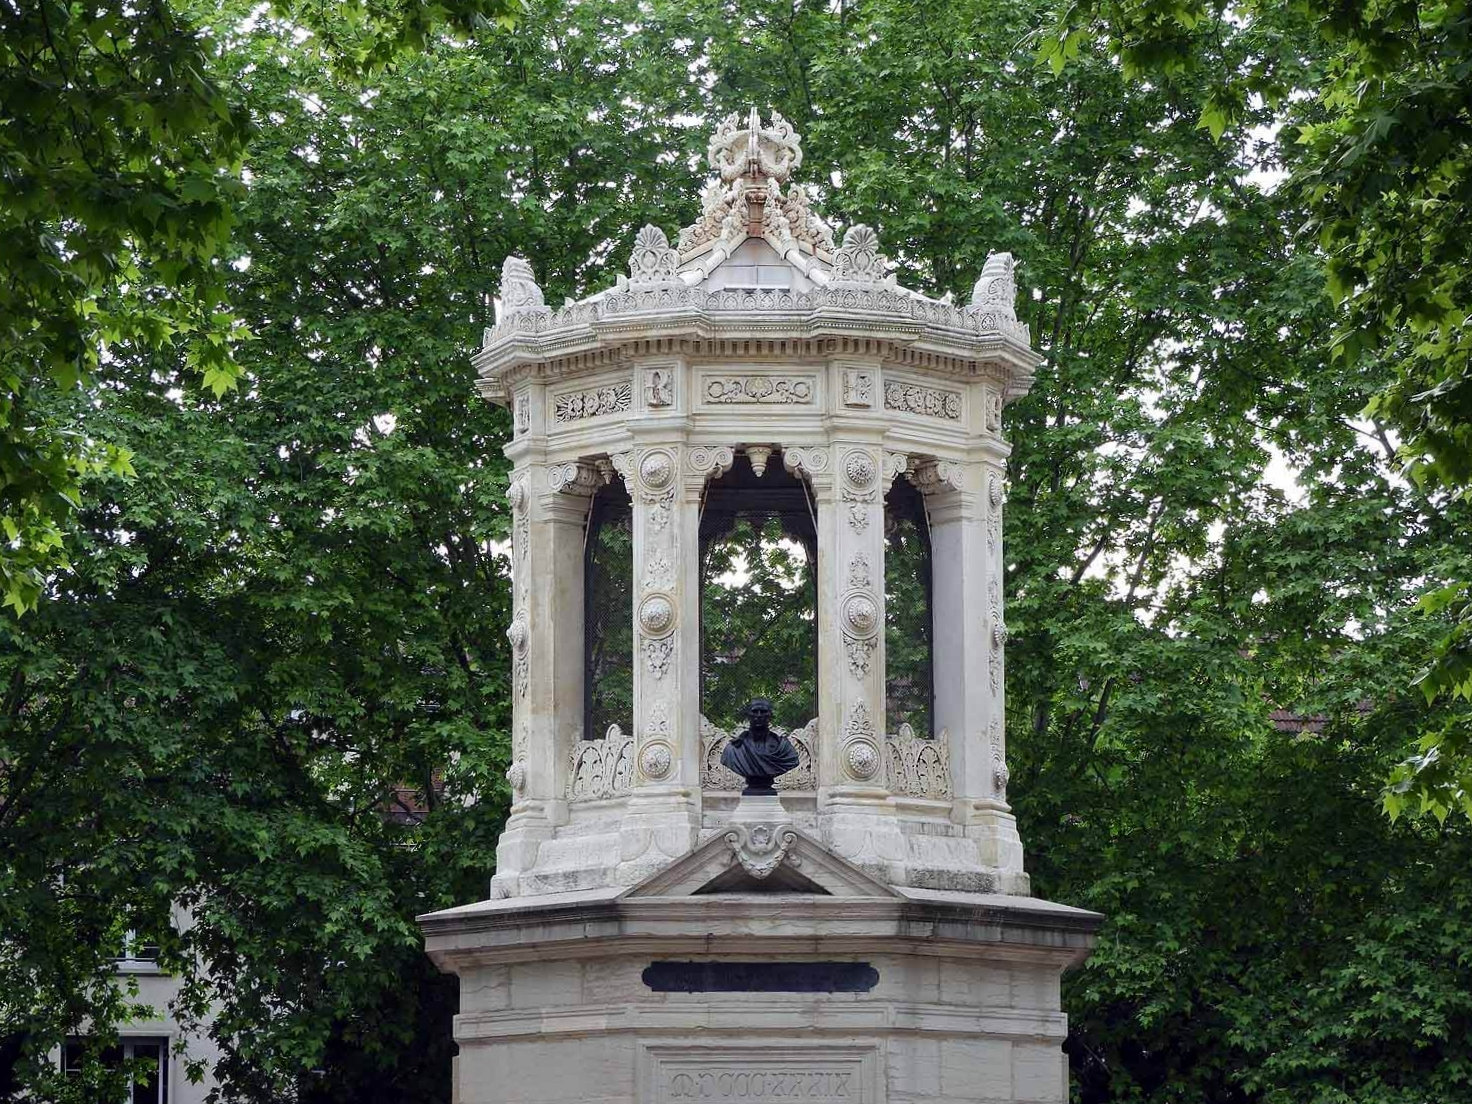 france-dijon-parc-darcy-monument.JPG